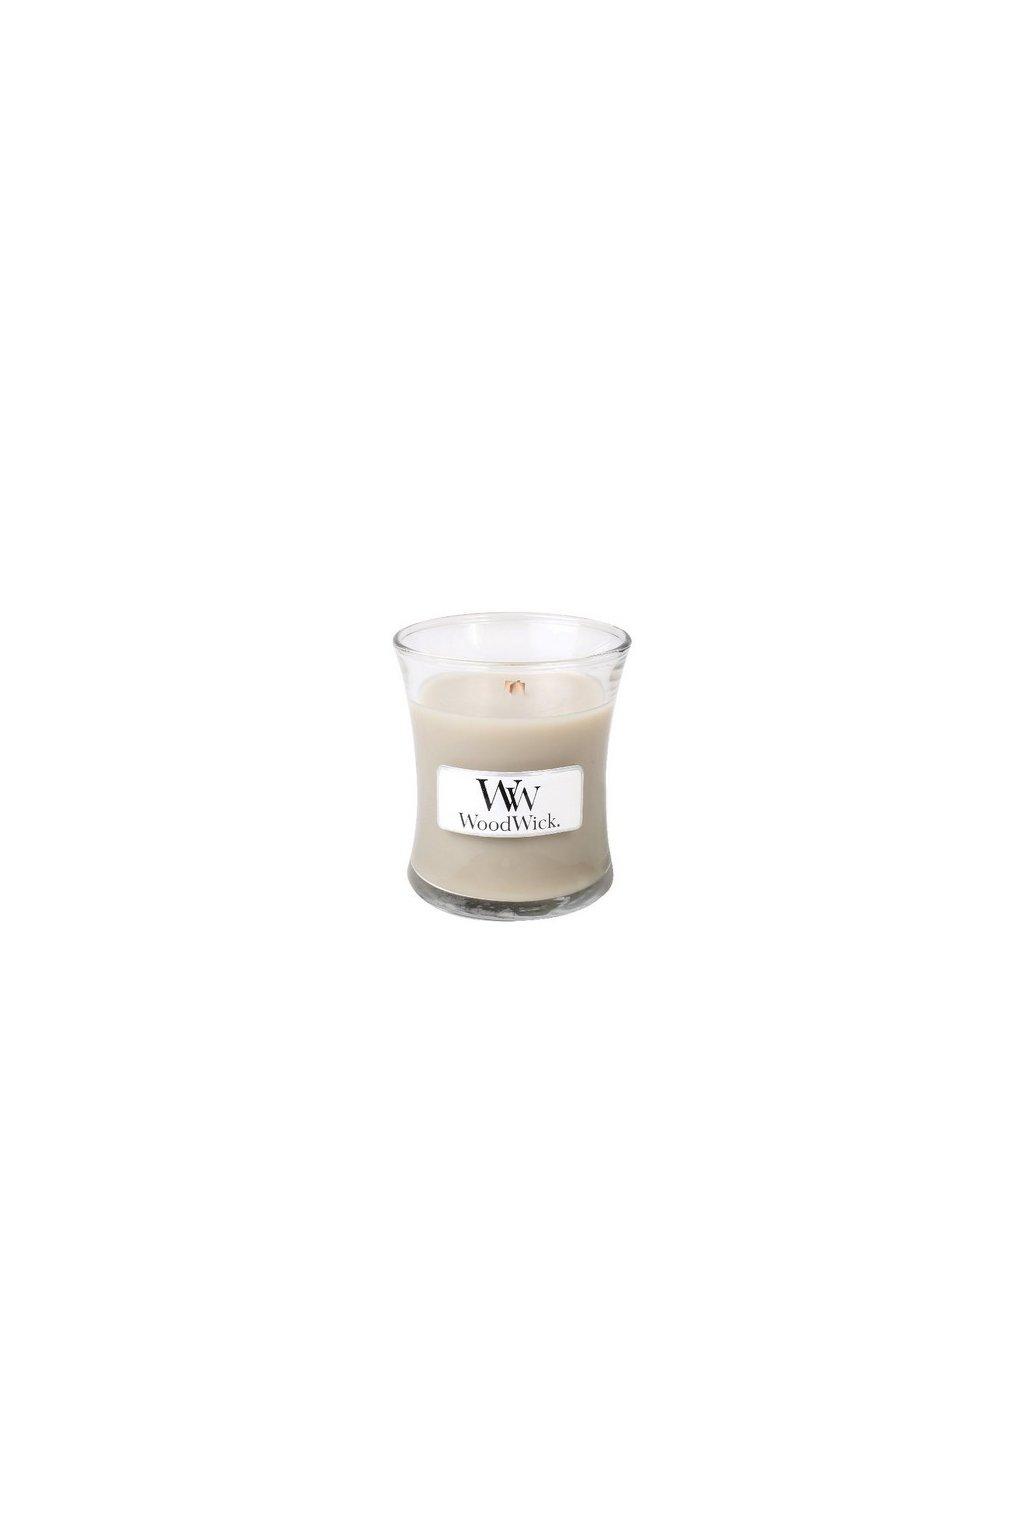 Woodwick Wood Smoke váza malá 85g